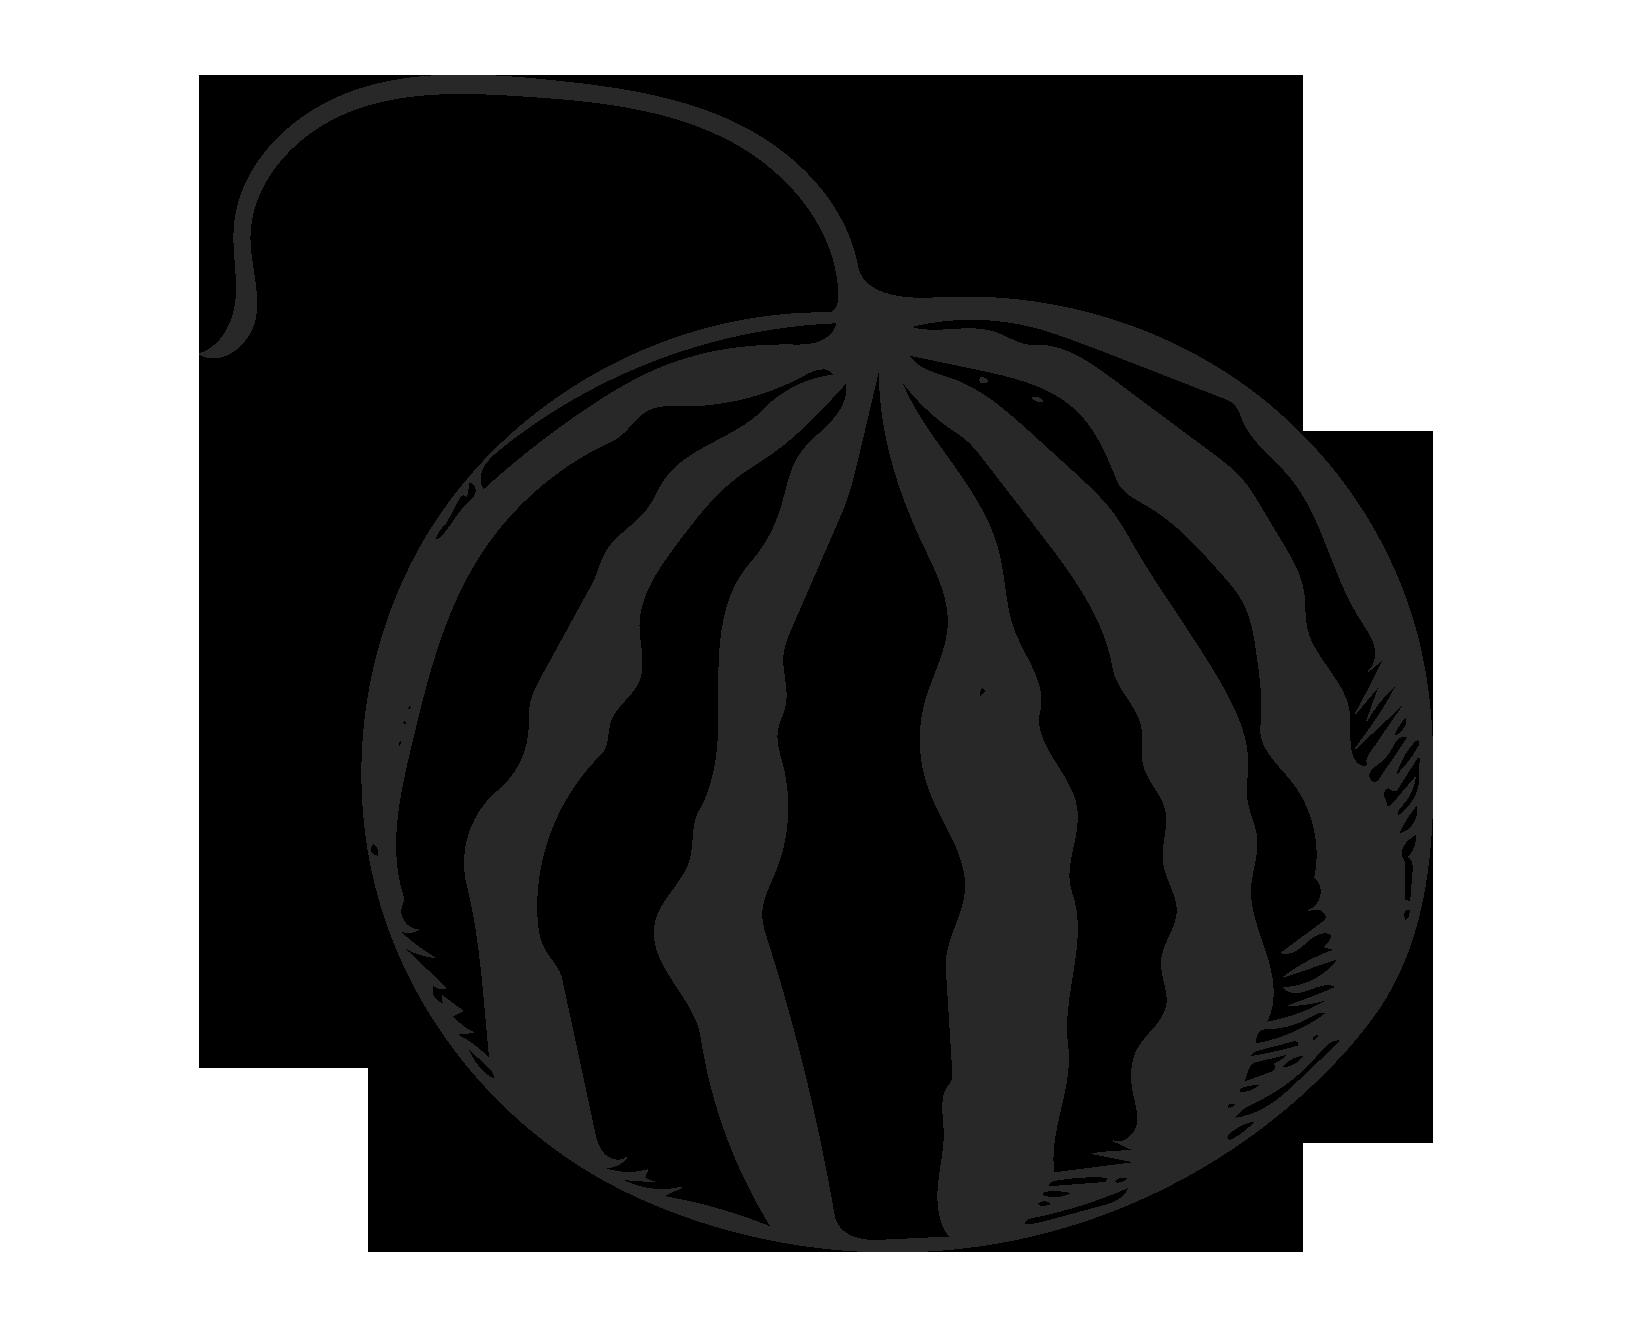 1628x1324 Drawing Fruit